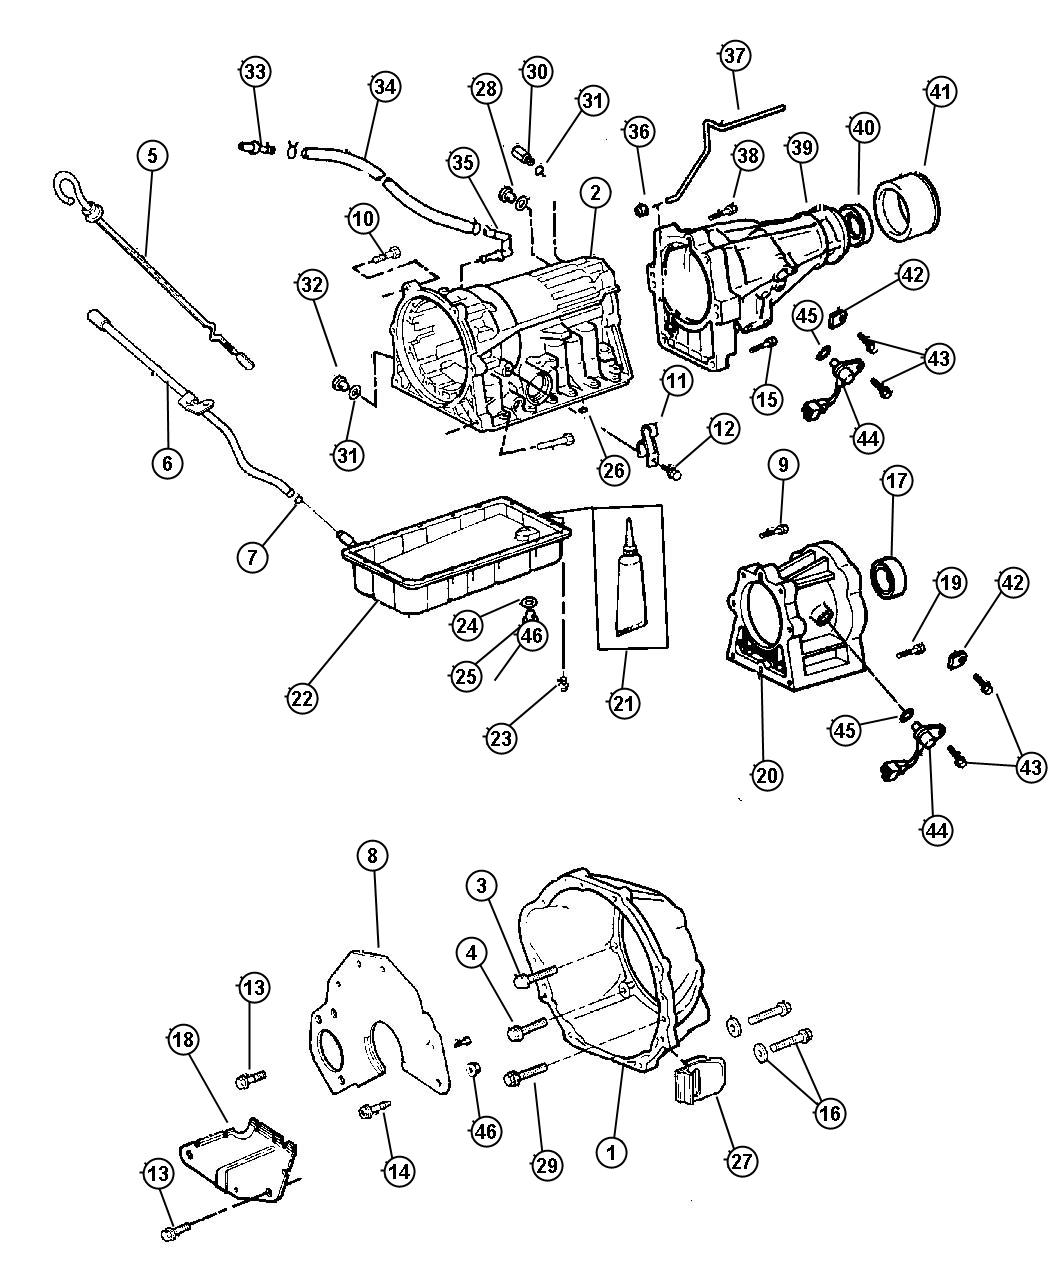 00i44585 Jeep Comanche Wiring Diagram on 2003 jeep grand cherokee engine diagram, jeep comanche carburetor, jeep comanche headlights, jeep hurricane wiring diagram, jeep comanche brake, jeep comanche schematics, jeep comanche transmission, jeep comanche lights, jeep comanche engine diagram, jeep comanche radiator diagram, jeep wrangler wiring diagram, jeep comanche timing, 1987 jeep wiring diagram, jeep comanche electrical, jeep comanche battery, jeep comanche exhaust system, jeep comanche door, jeep j20 wiring diagram, jeep comanche suspension diagram, jeep comanche tires,